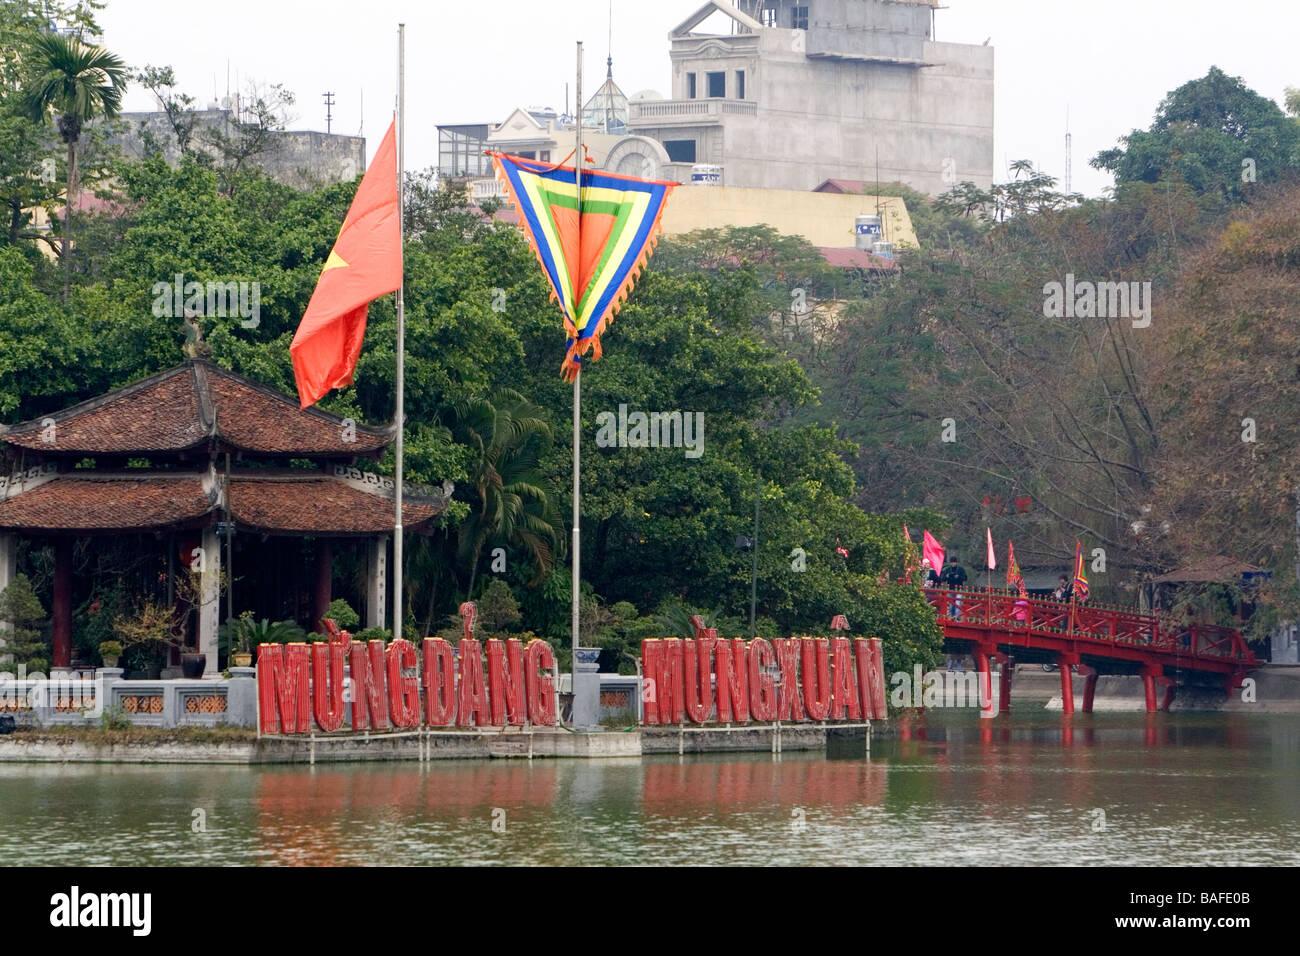 Ngoc Son Temple on Jade Island in Hoan Kiem Lake in Hanoi Vietnam - Stock Image